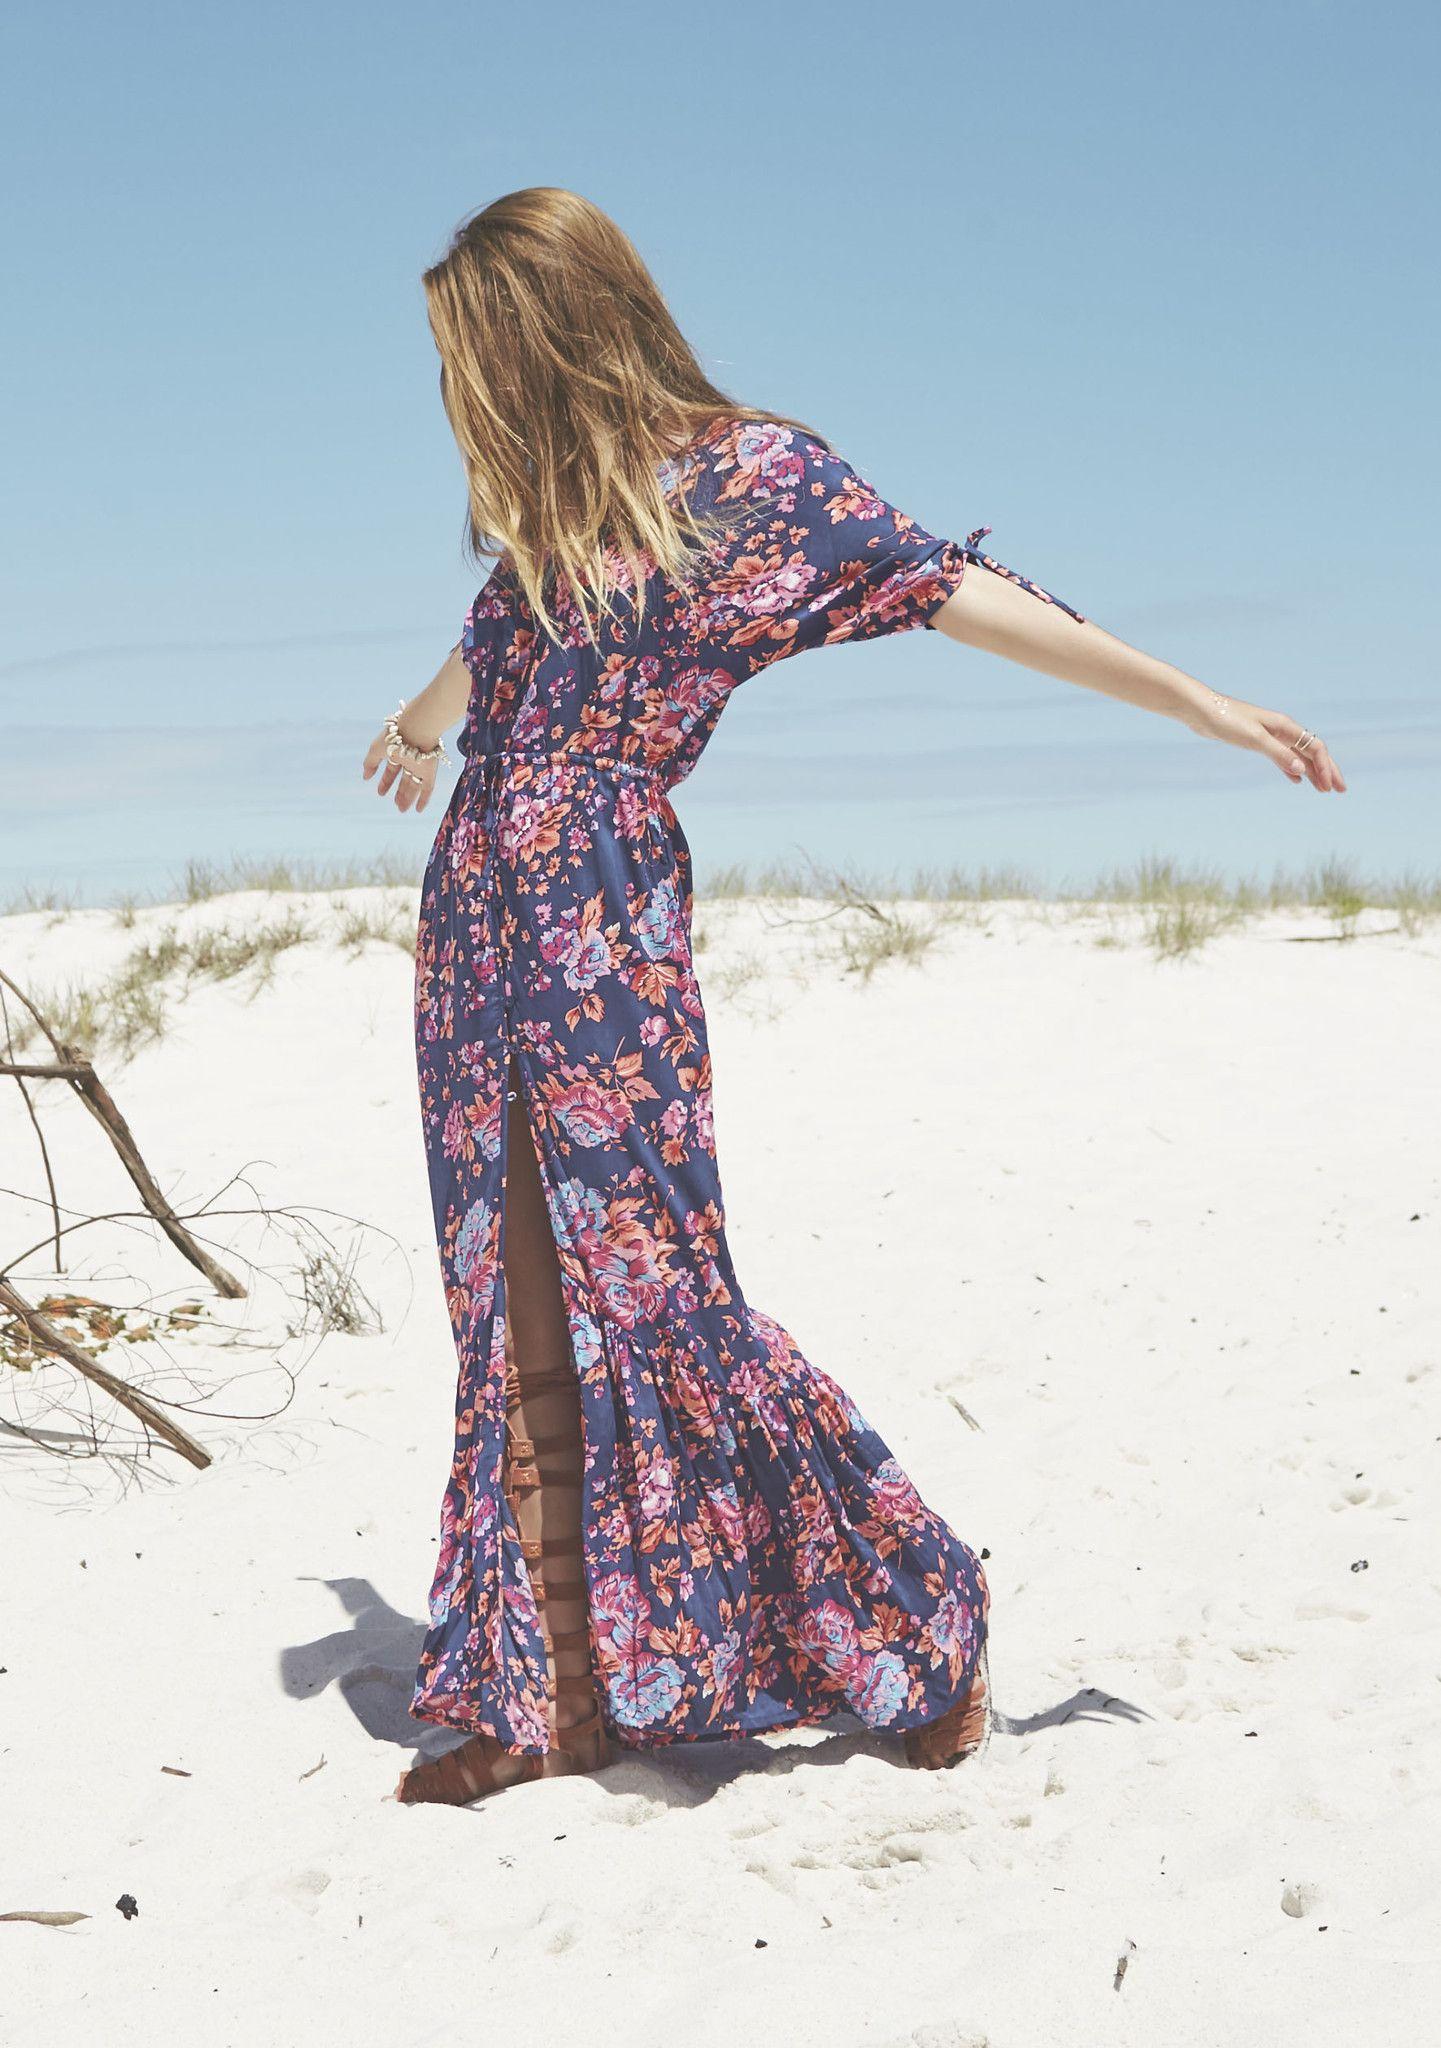 f0a8d9f1c Auguste - Diamonds Roamer Maxi Dress Sweet Magnolia - Boho Dress – AUGUSTE